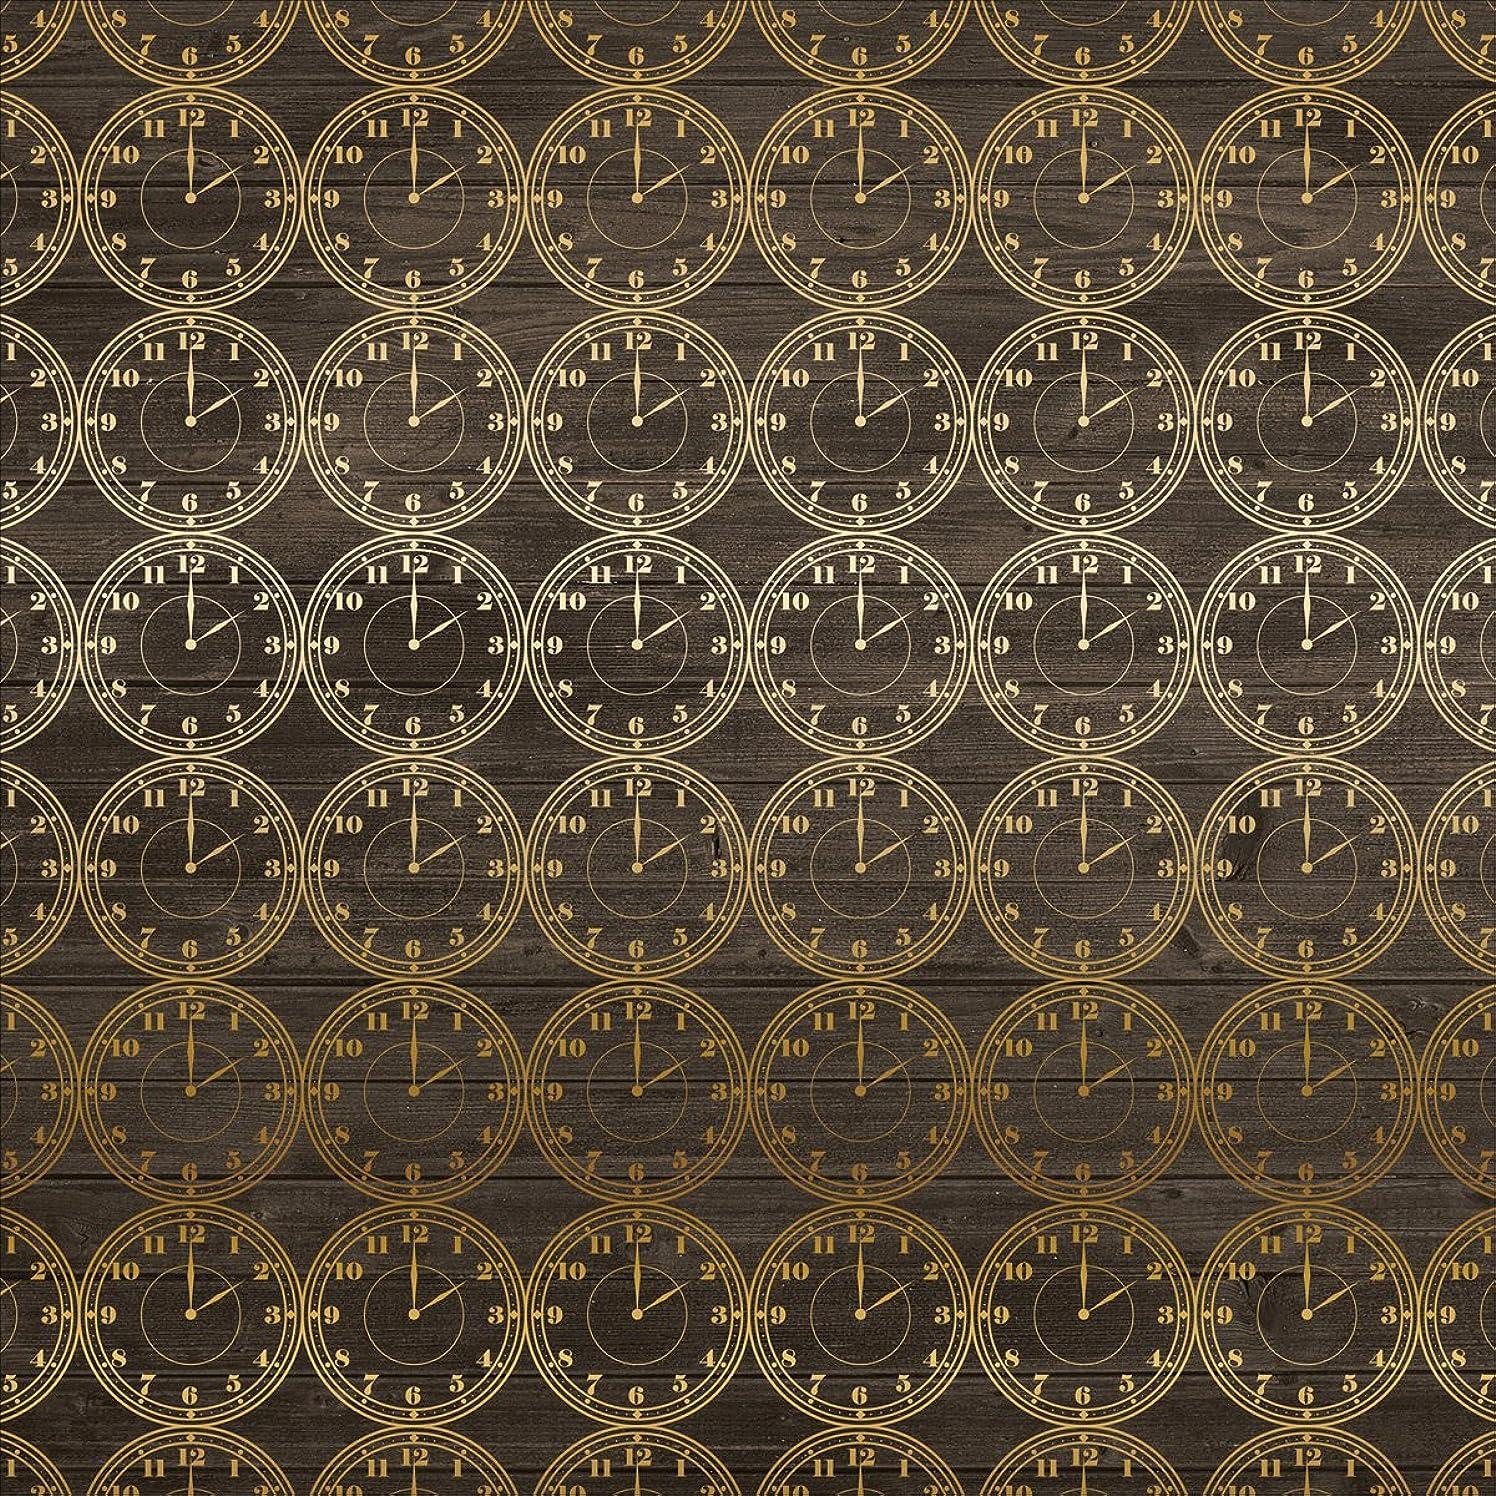 Echo Park Paper PS104051 Petticoats & Pinstripes Foiled Cardstock (15 Sheets Per Pack), 12